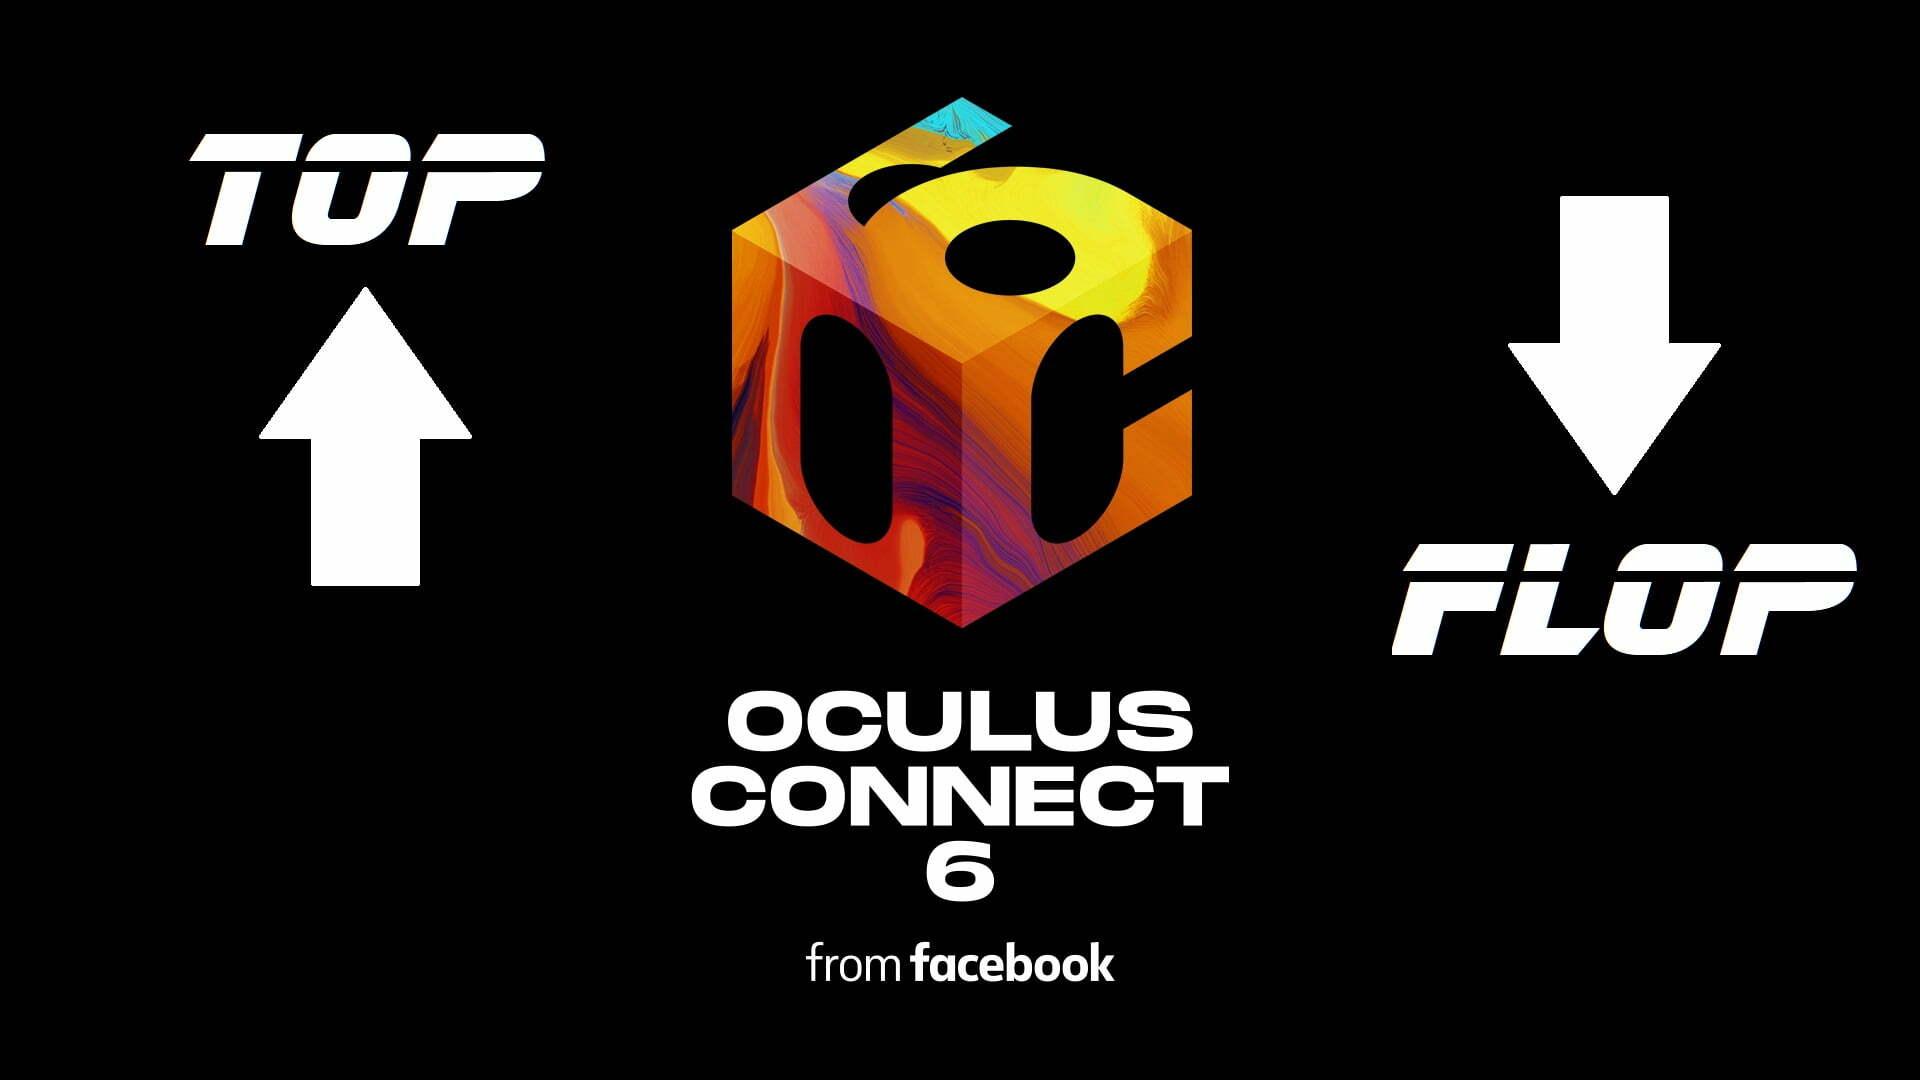 Top e flop dell'Oculus Connect 6